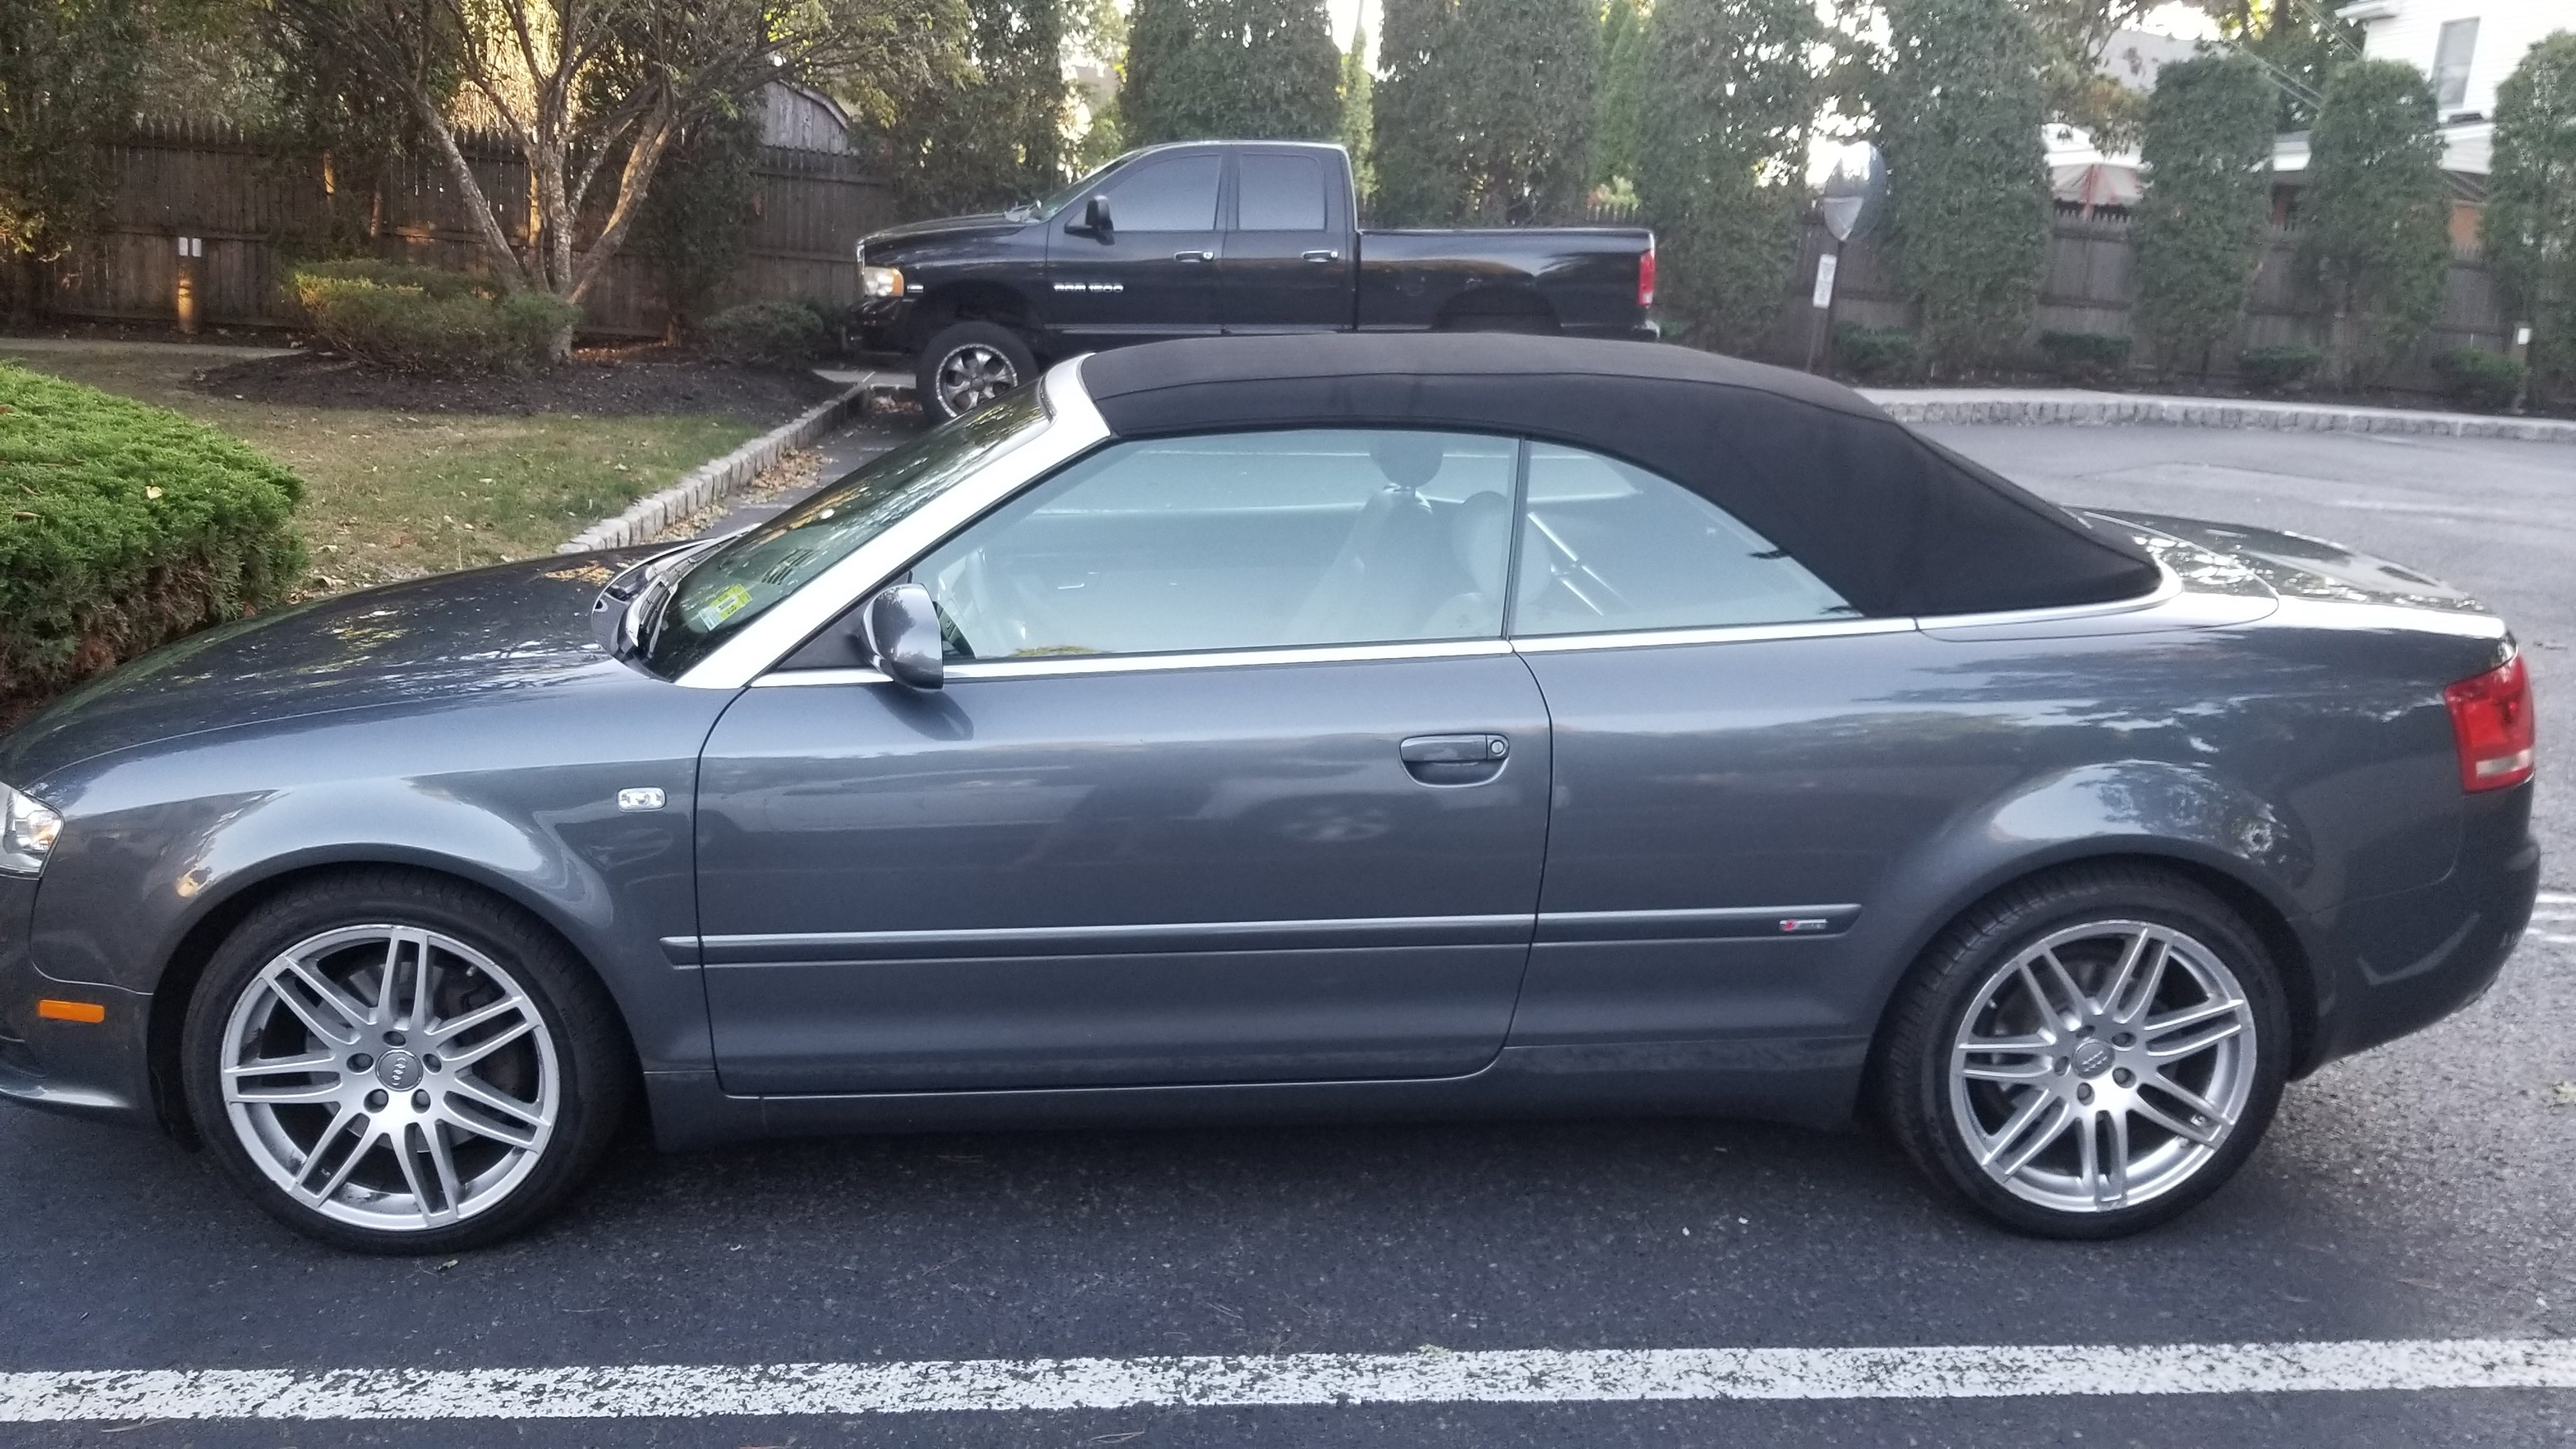 austin cc audi tx sale north interior convertible for in